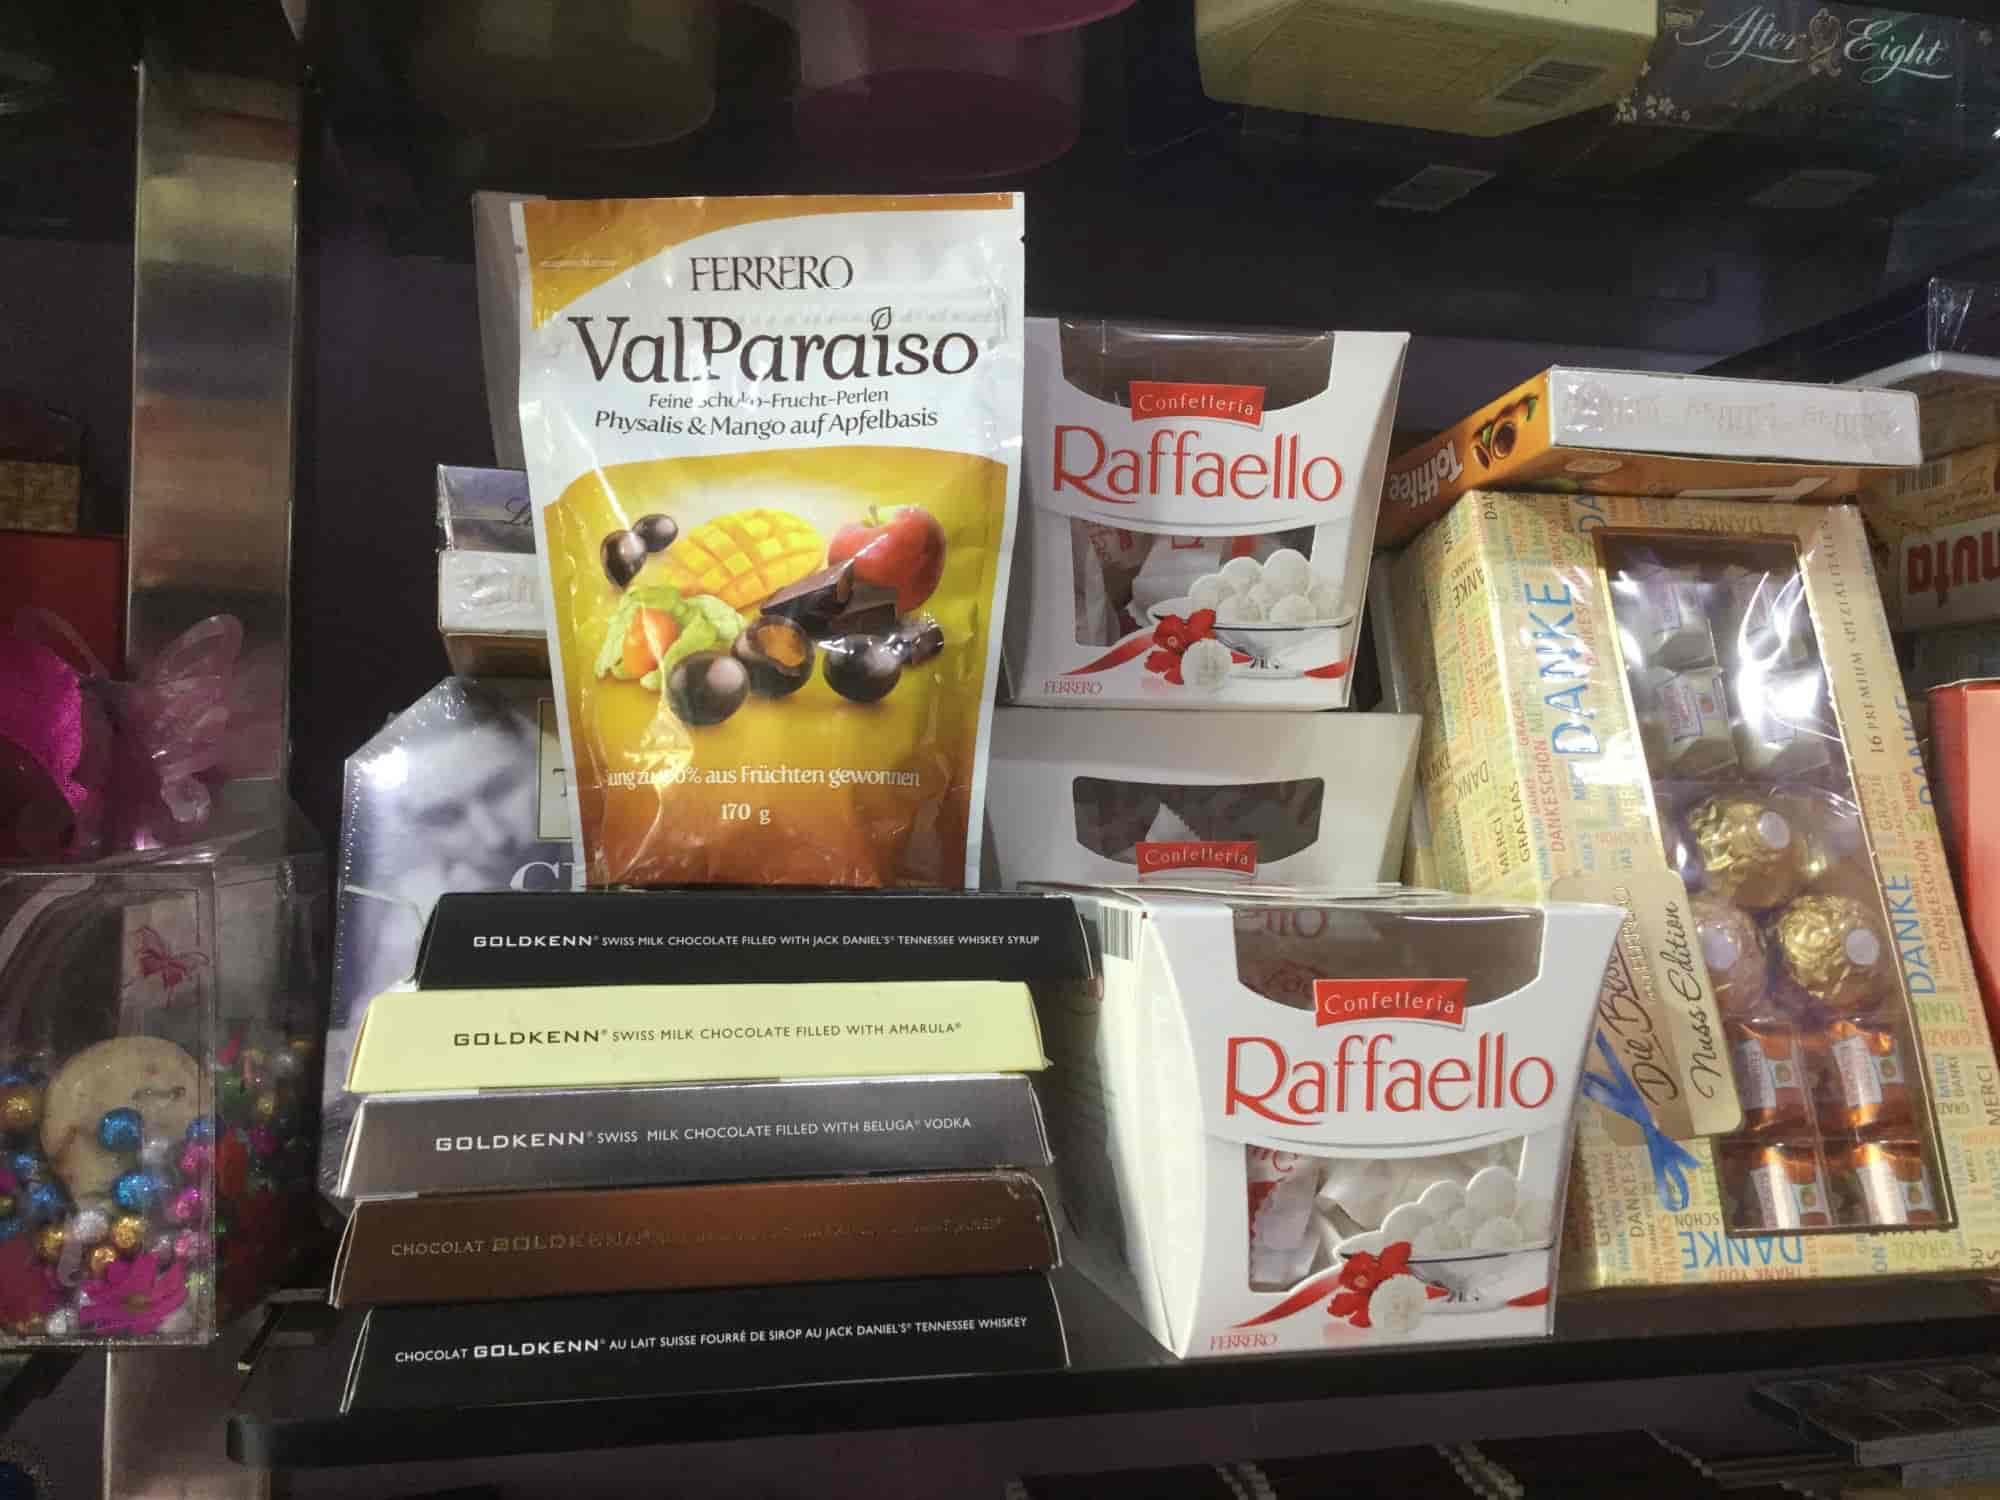 Harga Jual Alpenliebe Candy Caramel Stick Box 16 Termurah 2018 Carvil Sepatu Casual Dress Men Gusten Black Hitam 41 Chocolate Hub C Scheme Manufacturers In Jaipur Justdial